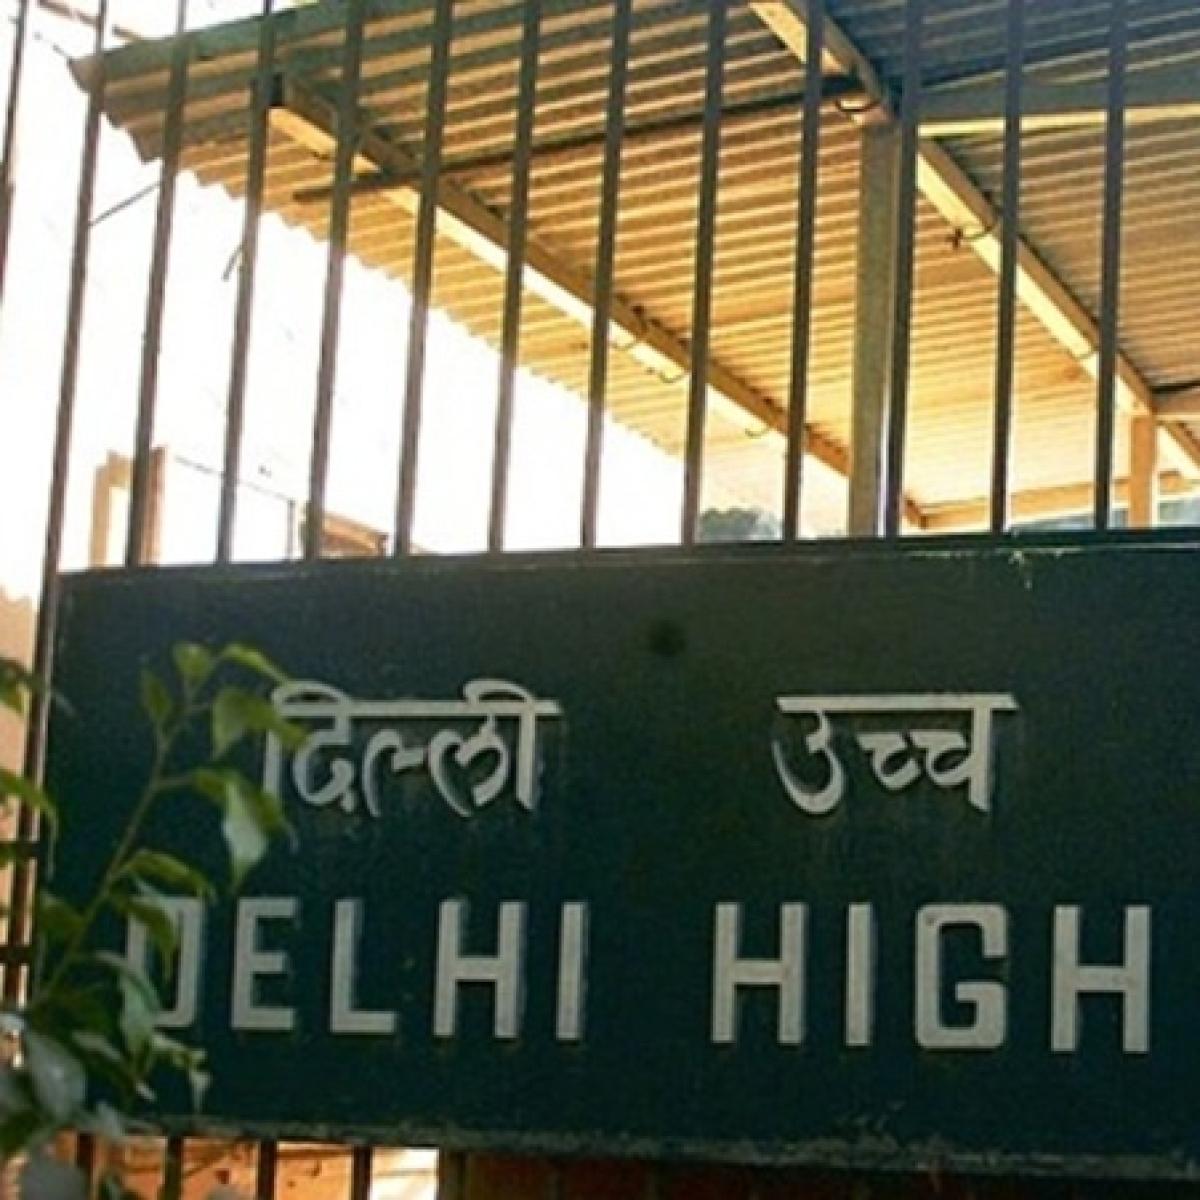 Delhi HC dismisses plea challenging Union minister Harsh Vardhan's election